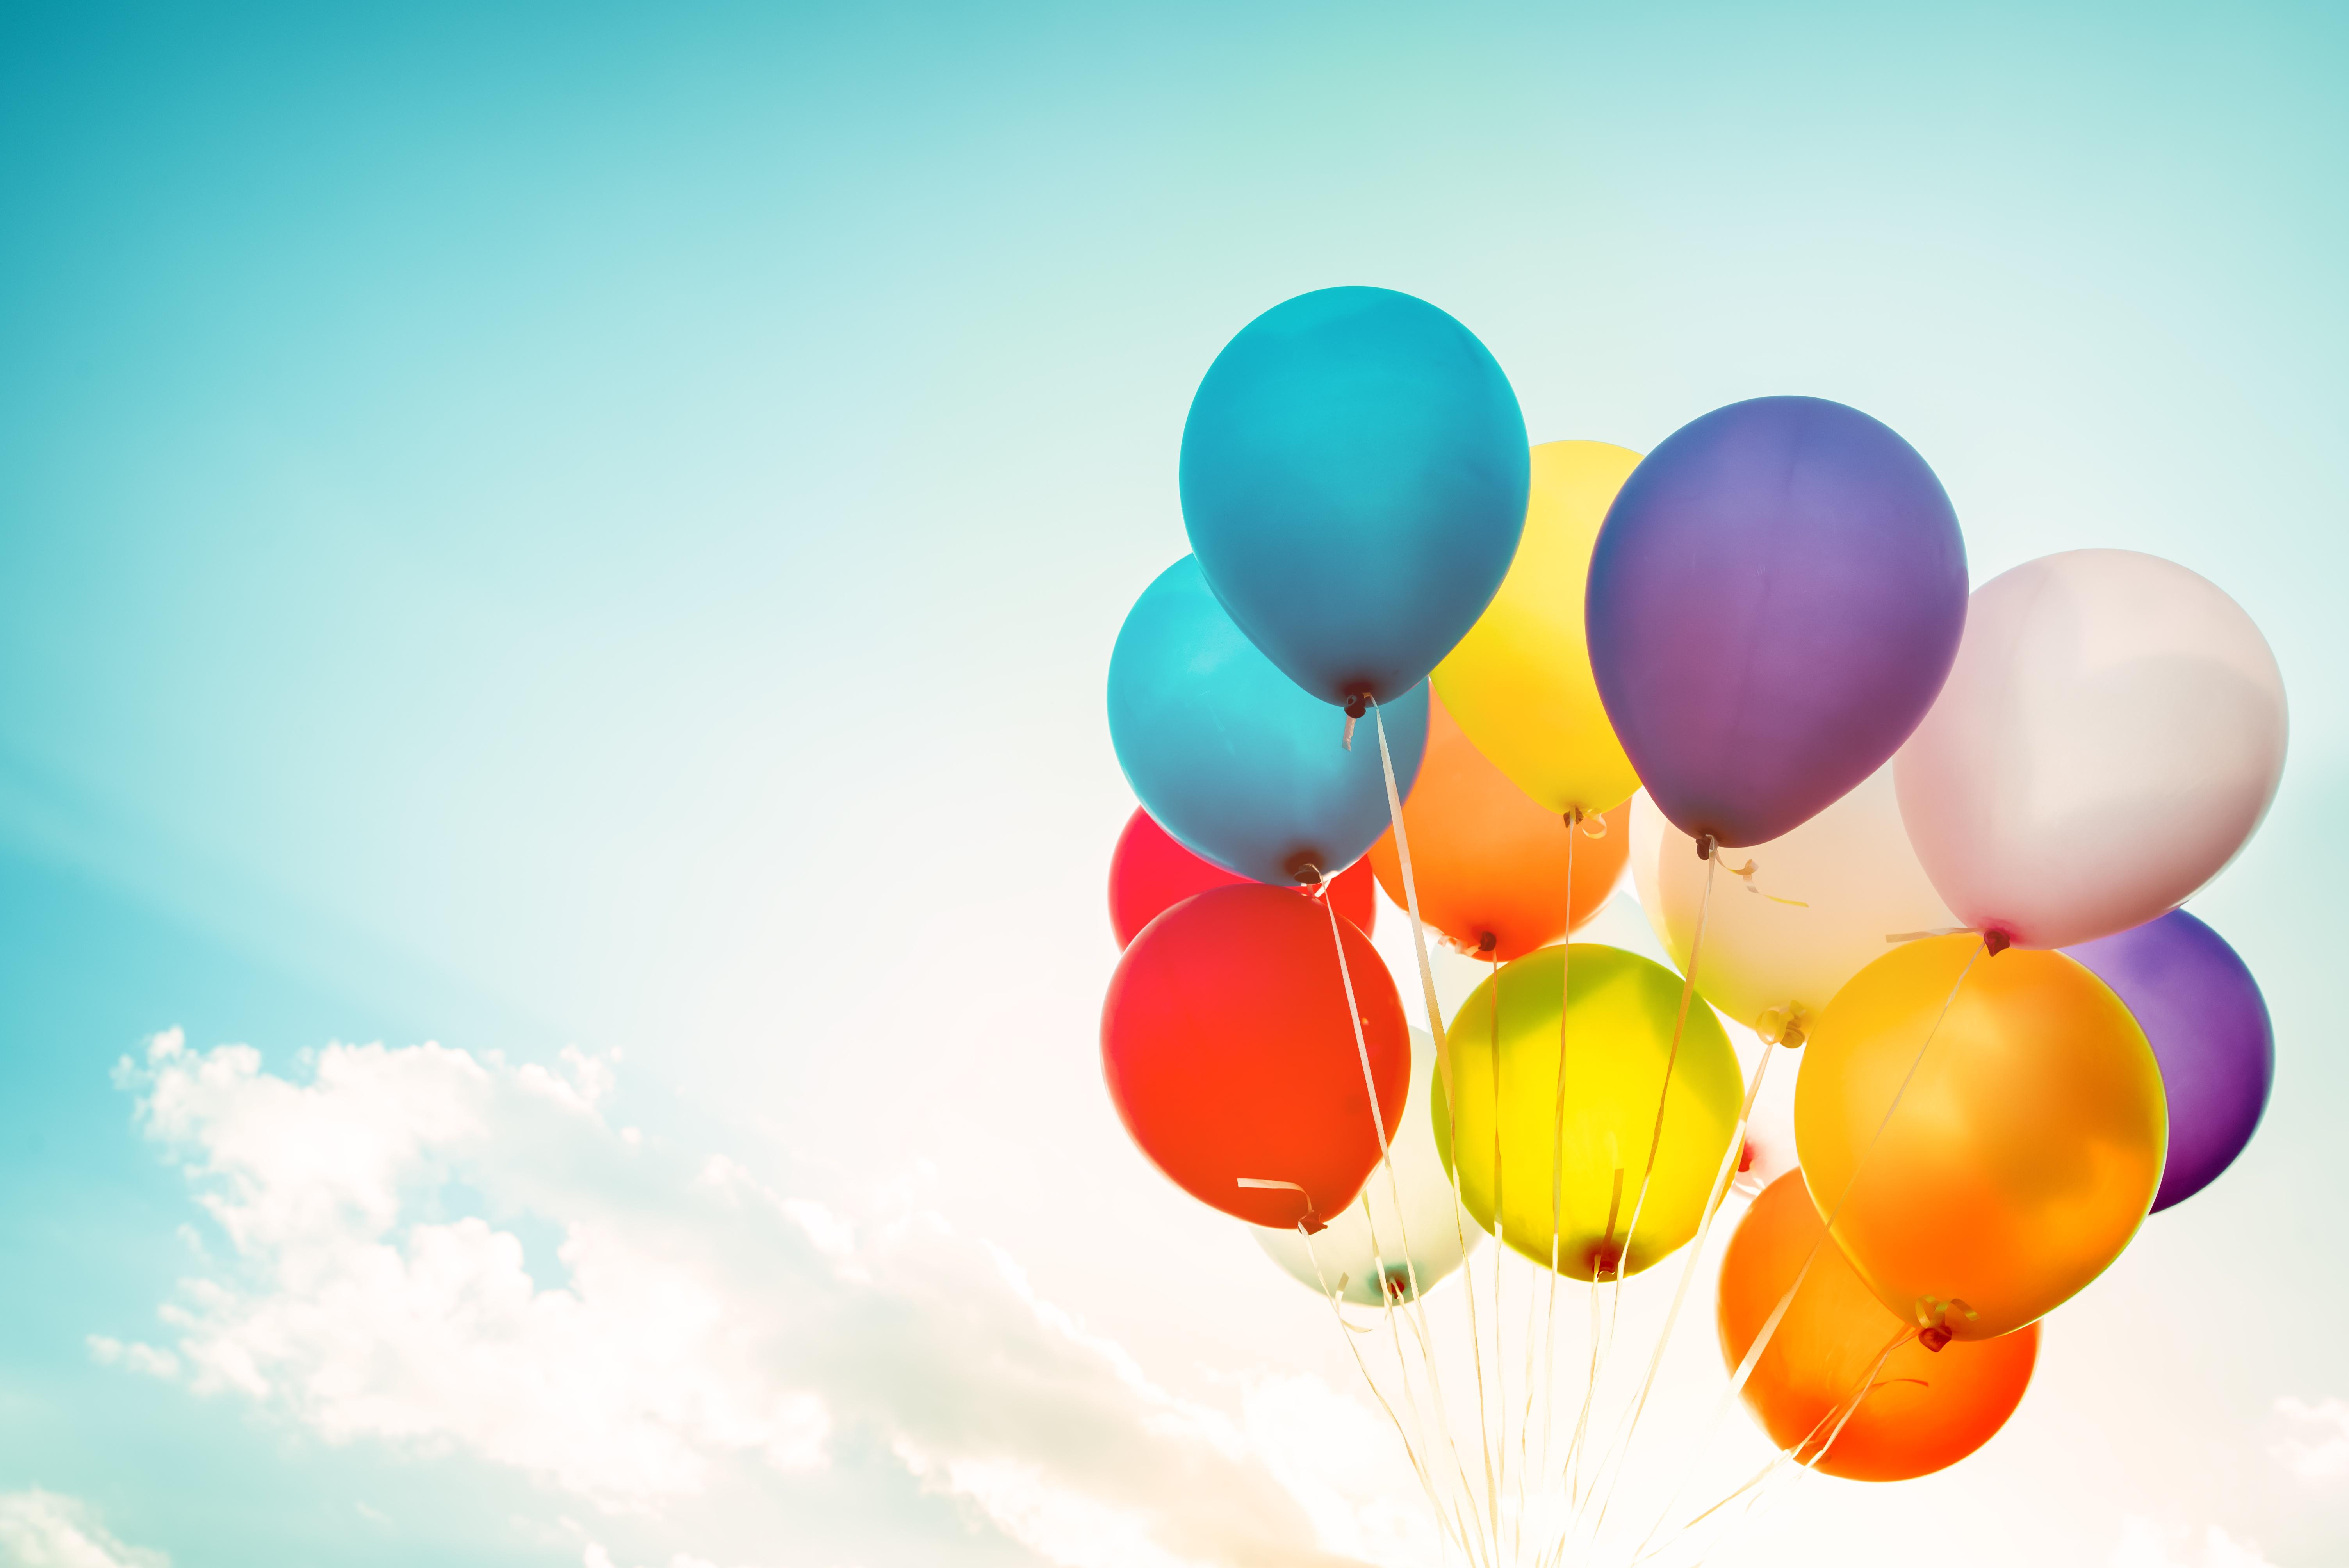 colorful air balloons 1574938628 - Colorful Air Balloons -